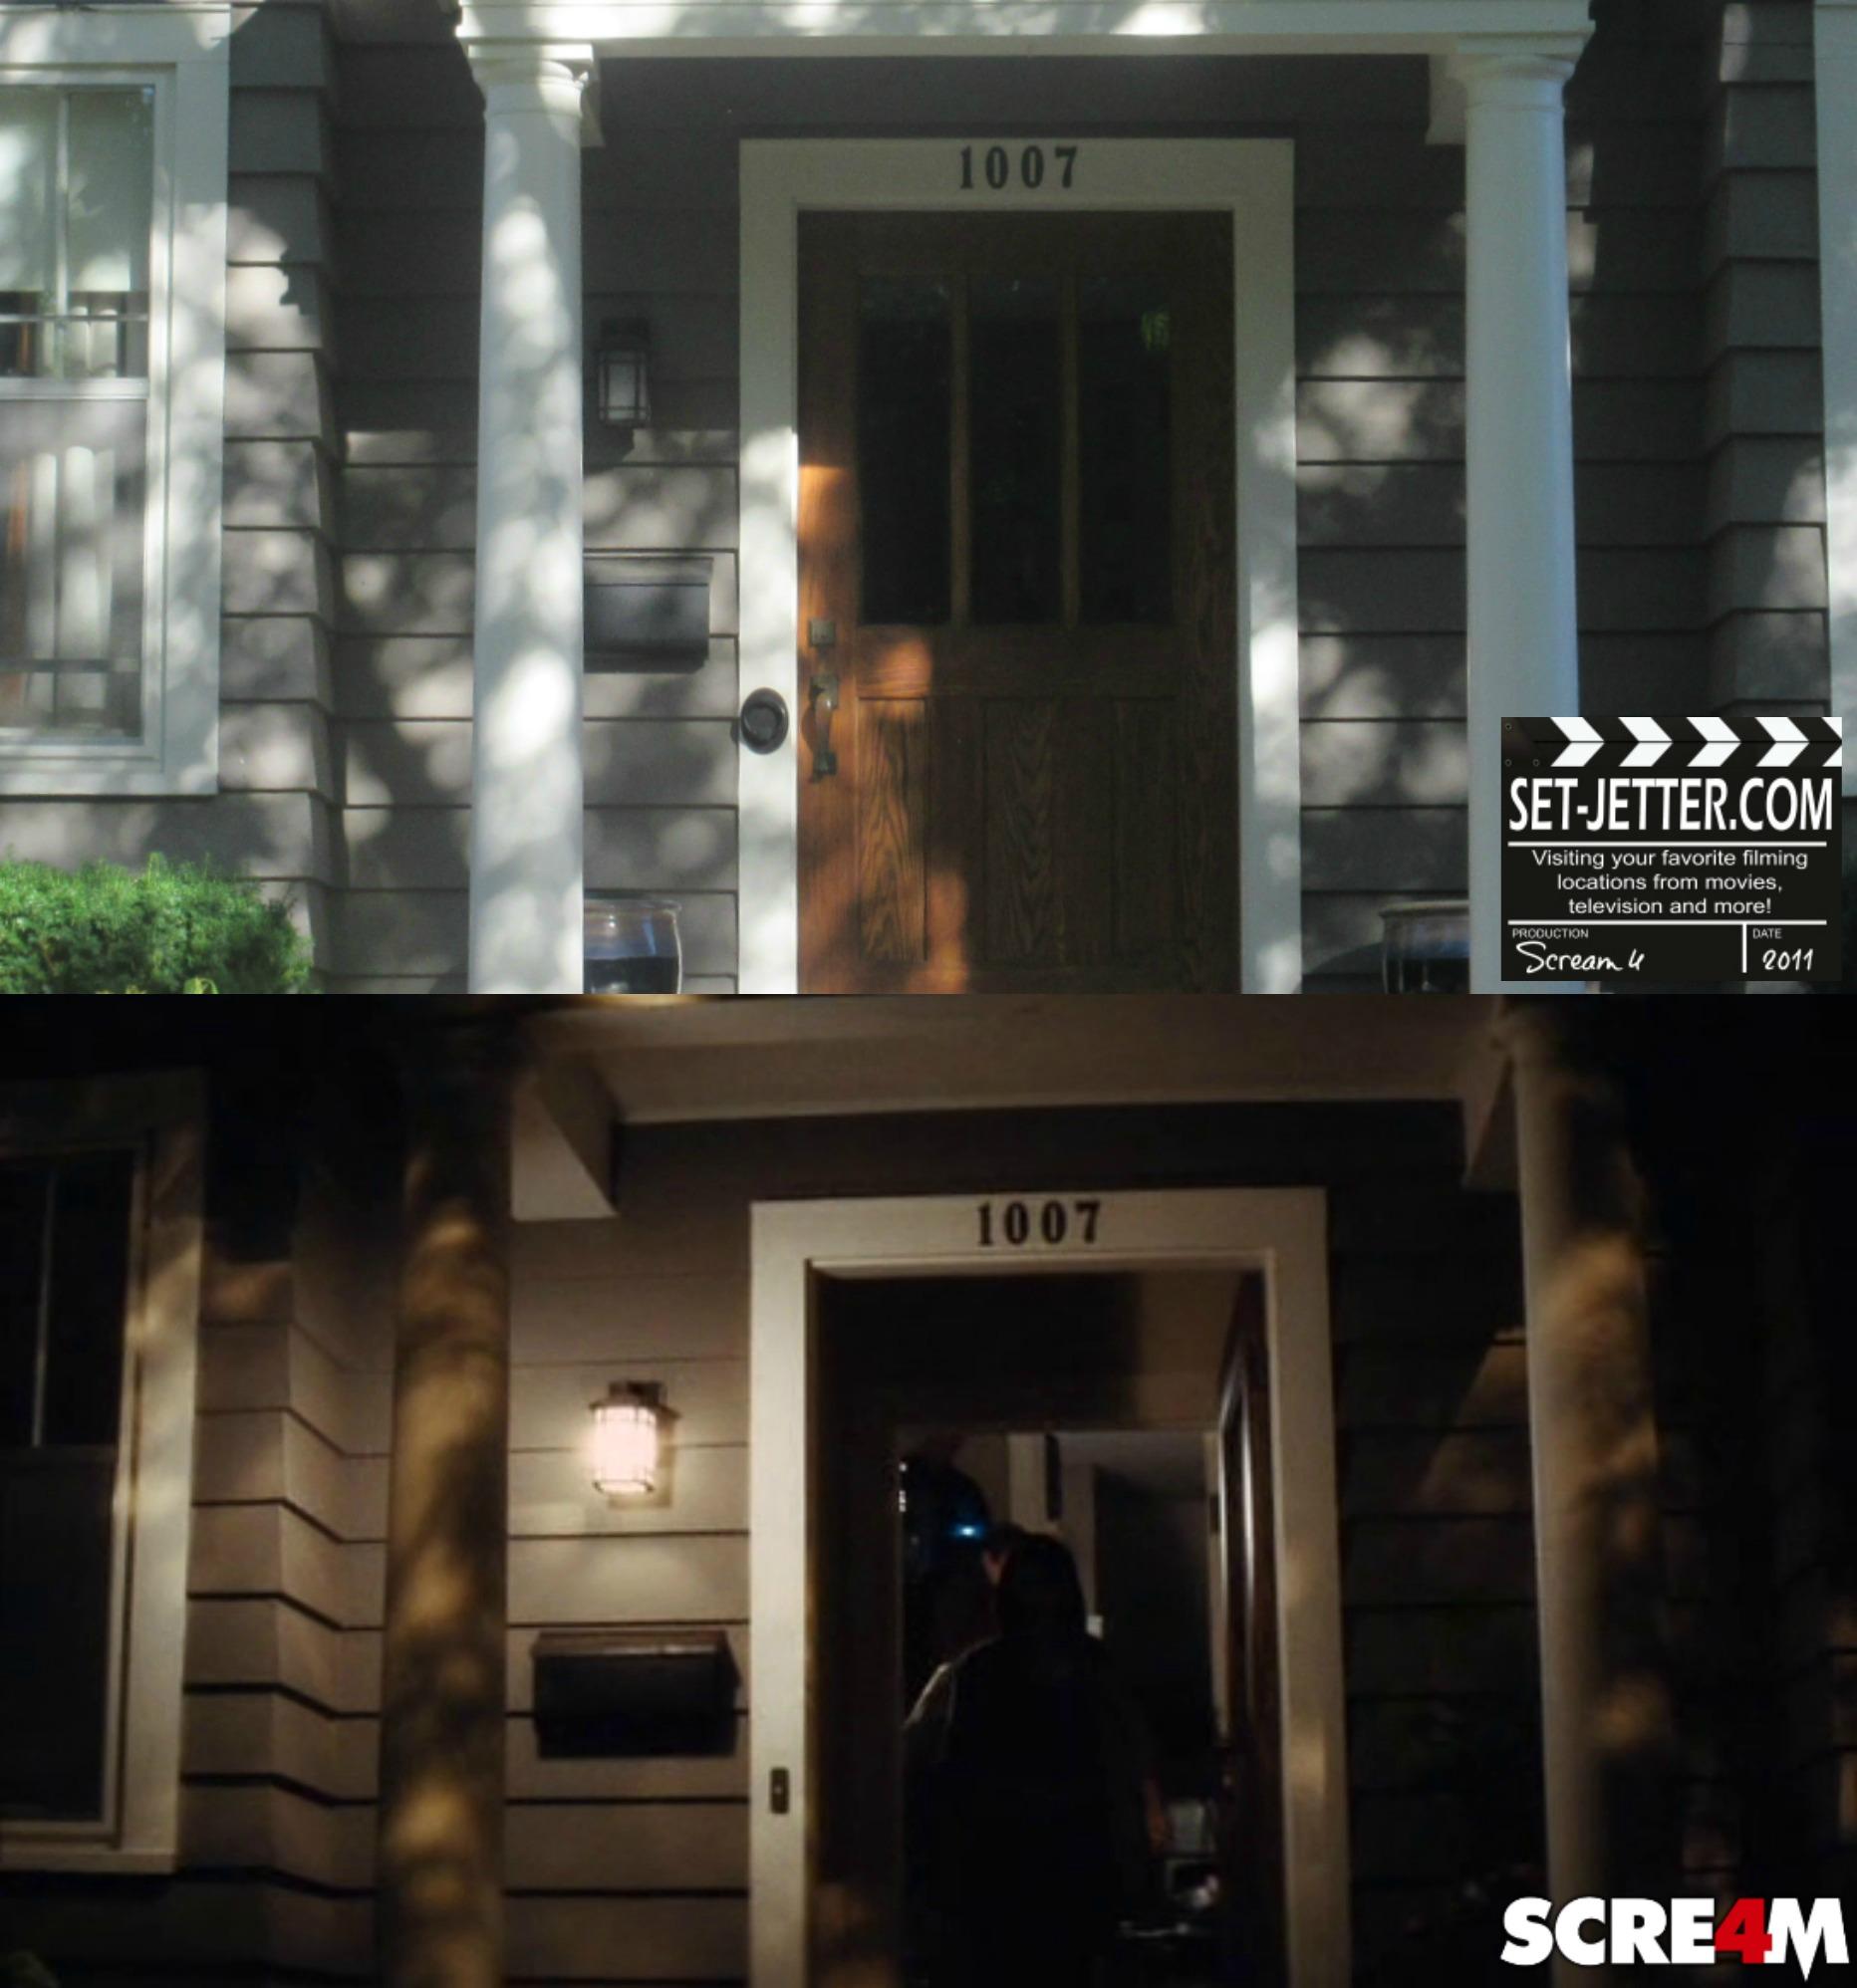 Scream4 comparison 126.jpg